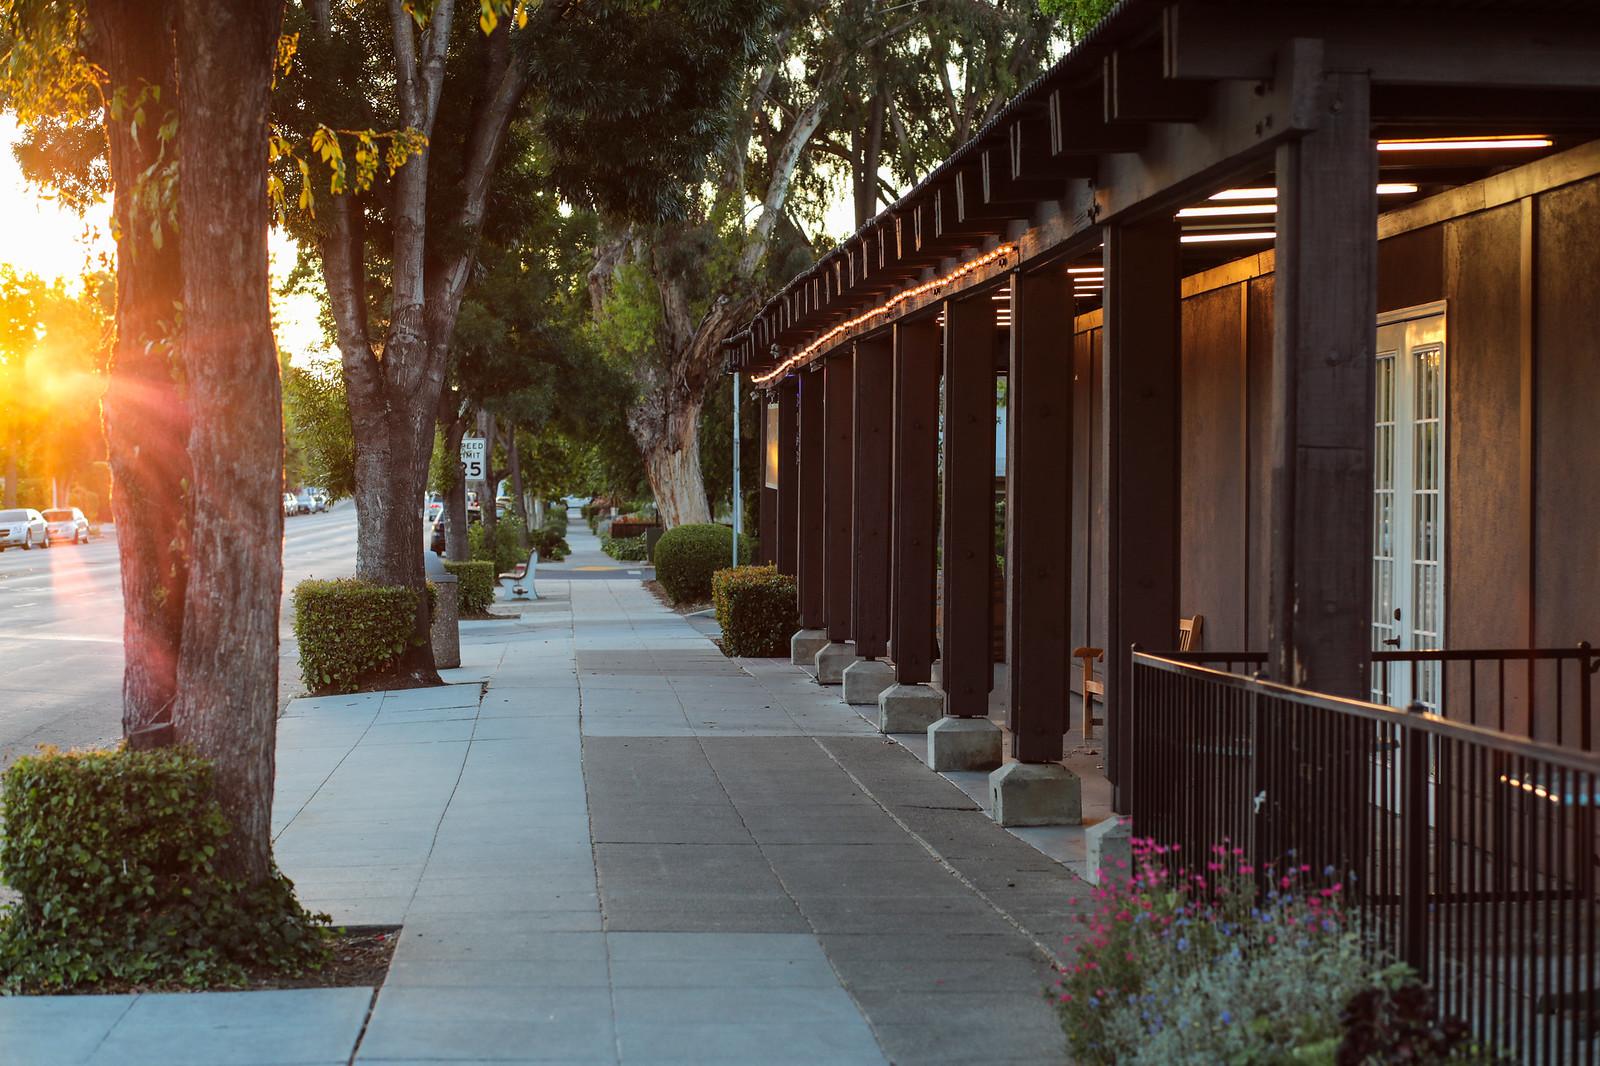 Midtown+Palo+Alto+Blu+Skye+Media-1137-X3.jpg